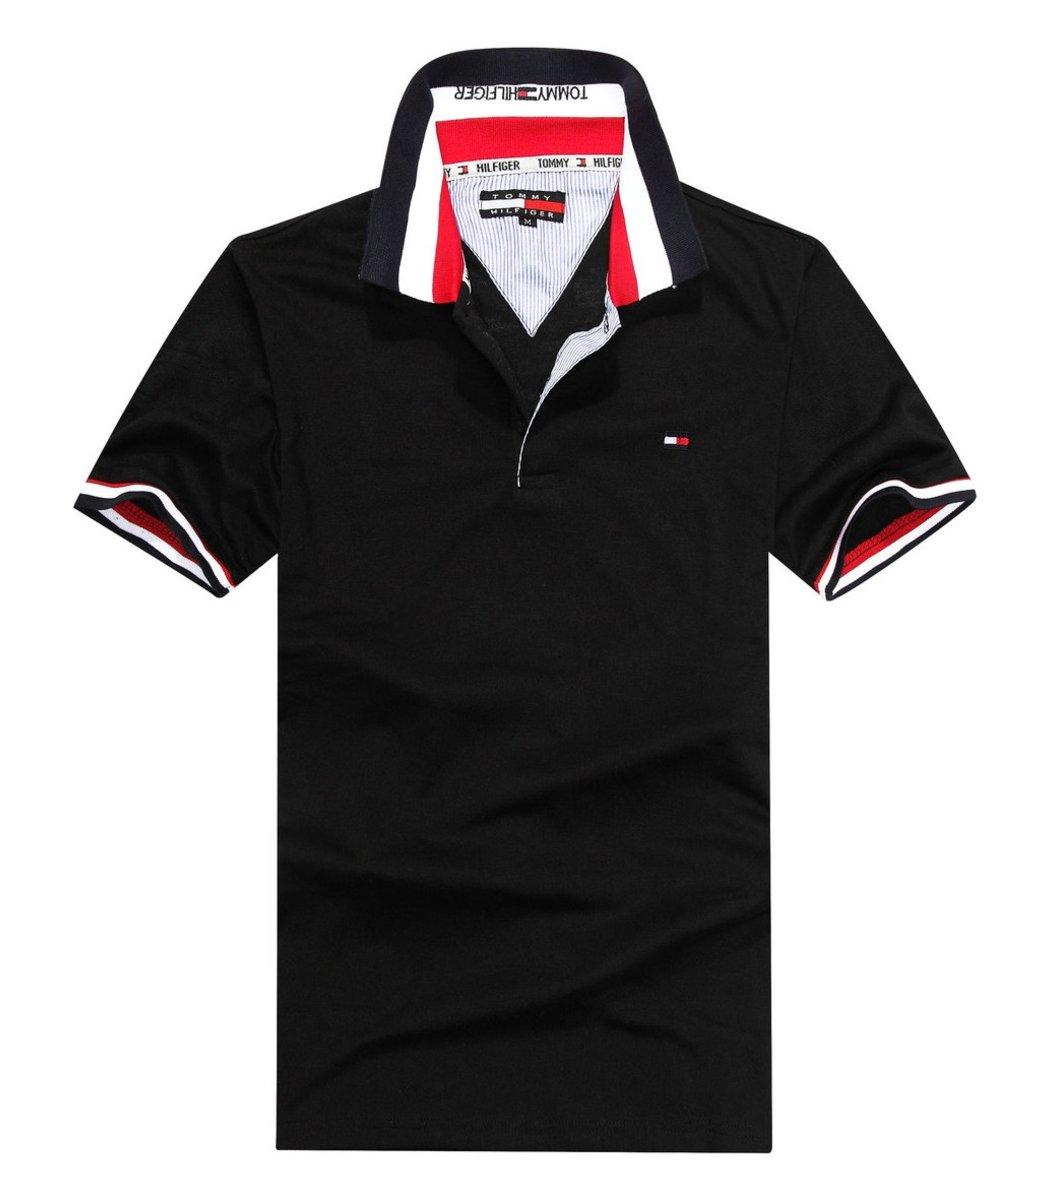 Мужская черная футболка поло Tommy Hilfiger